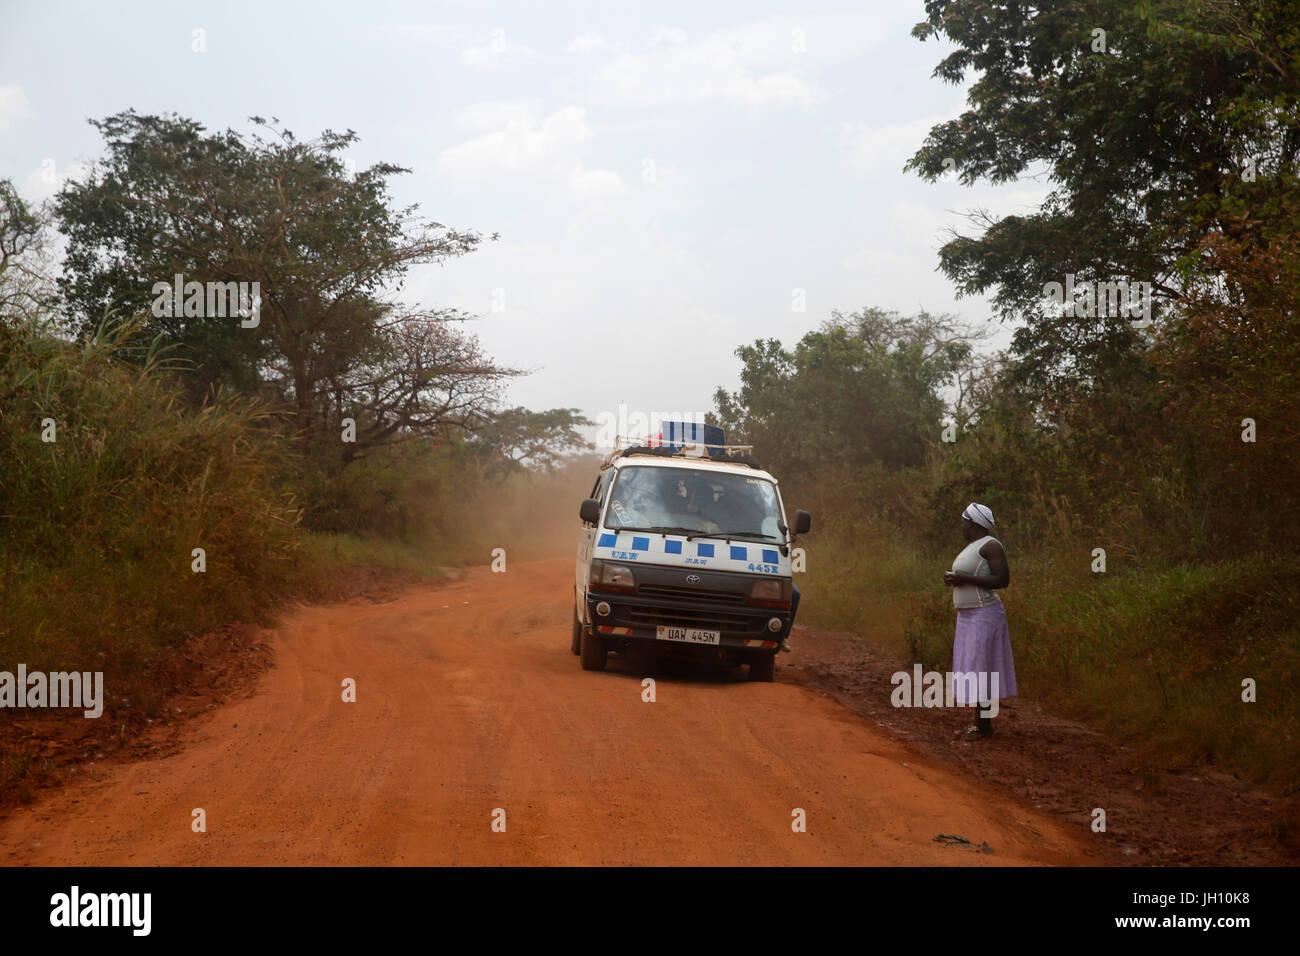 Minibus on an African road. Uganda. - Stock Image